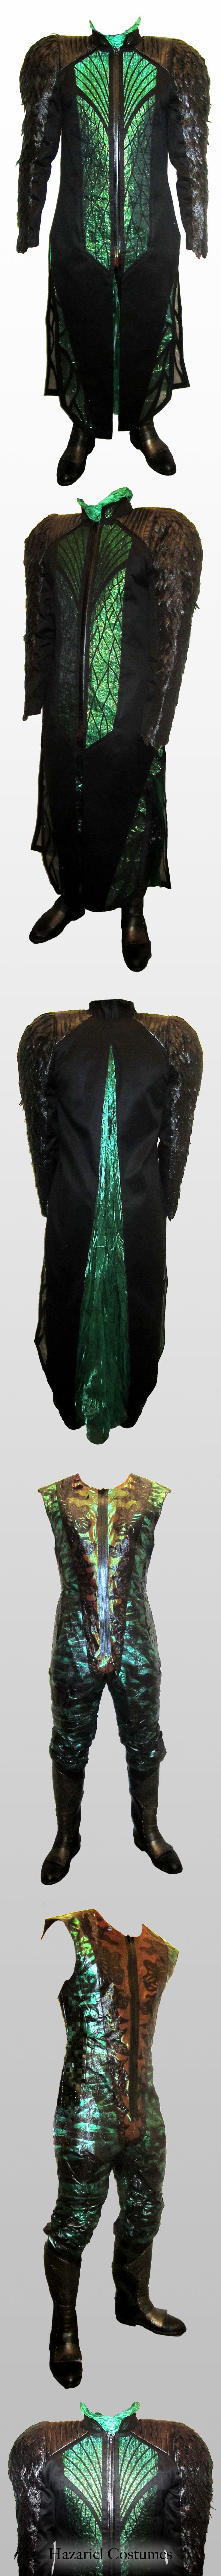 Fantasy costume  black and green handmade and unique